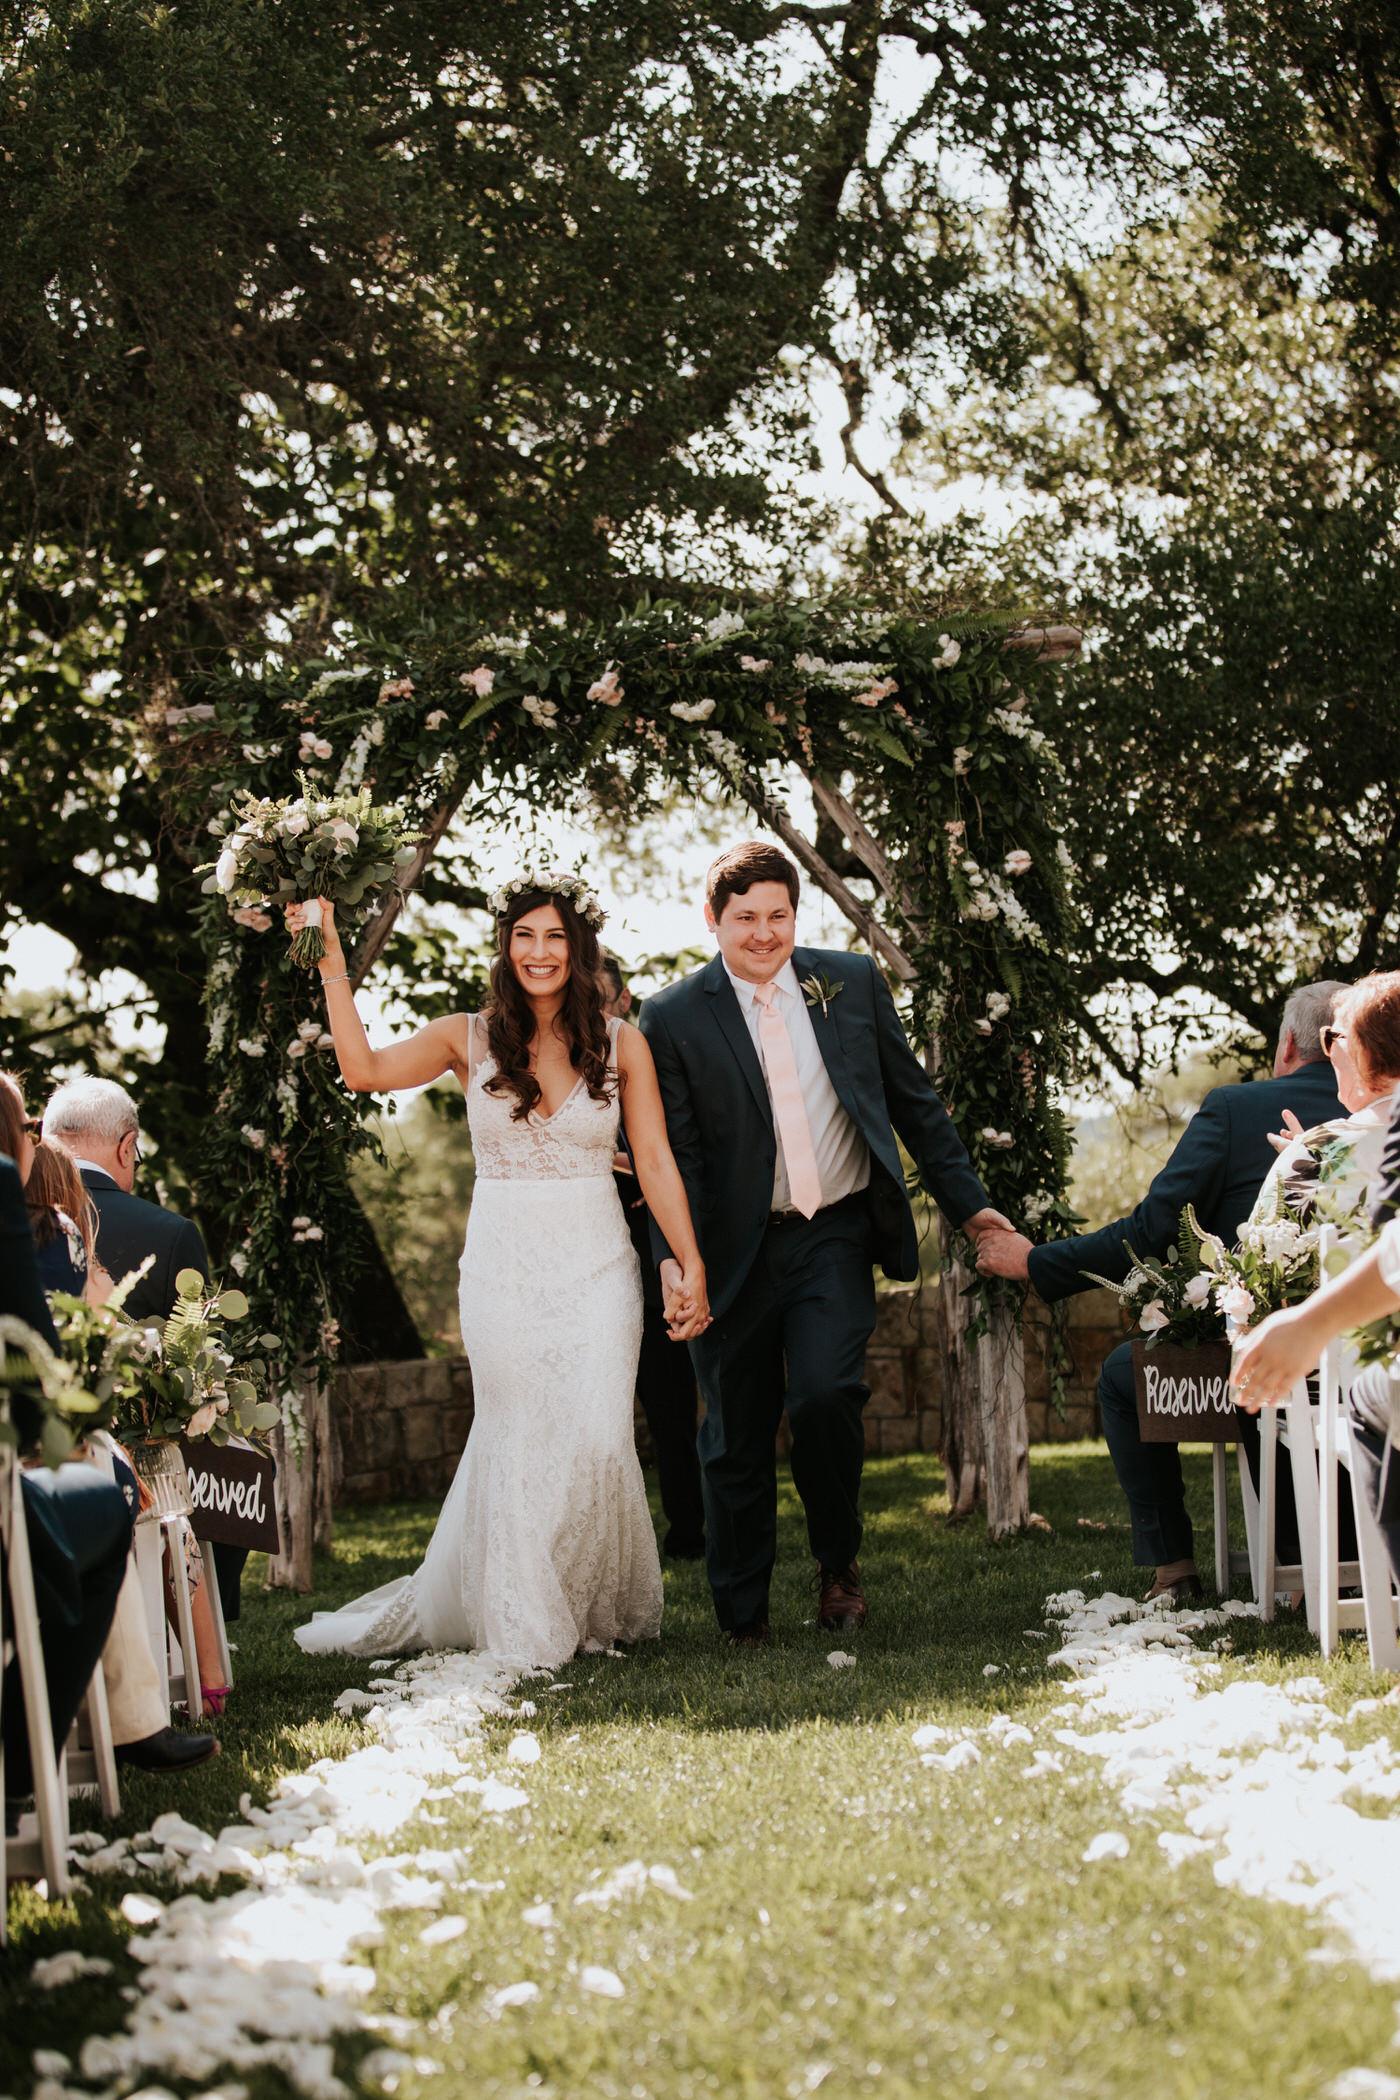 Thurman Mansion Wedding - Diana Ascarrrunz Photography -479.jpg